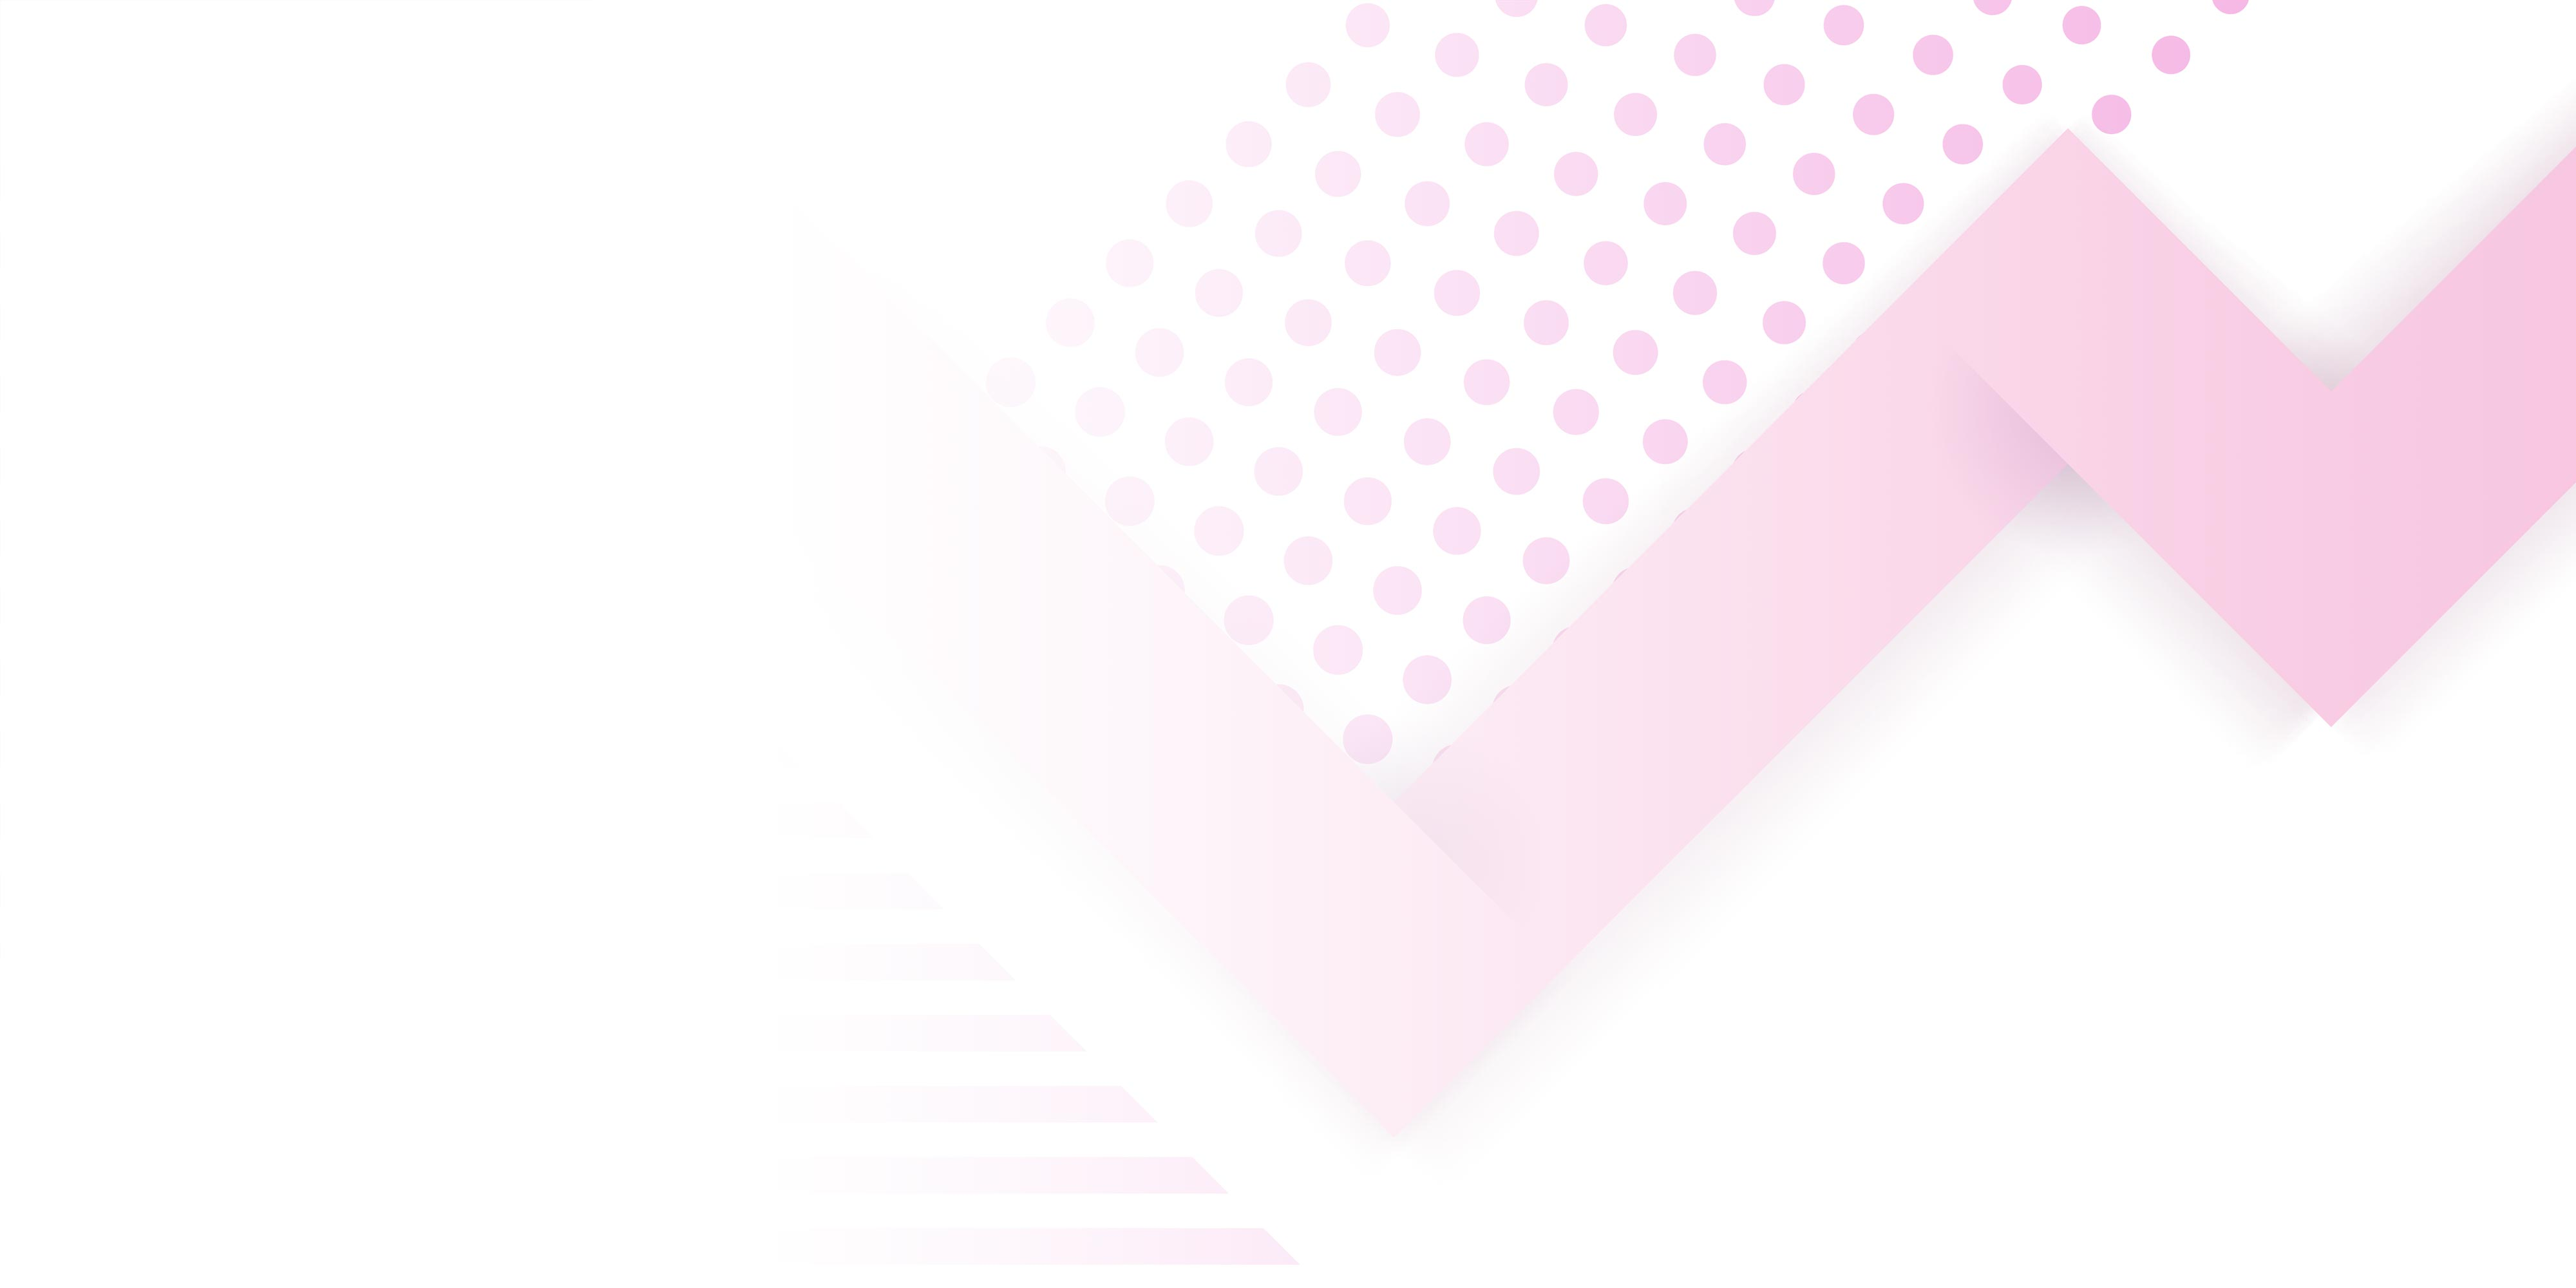 abstract-bg-1-lg